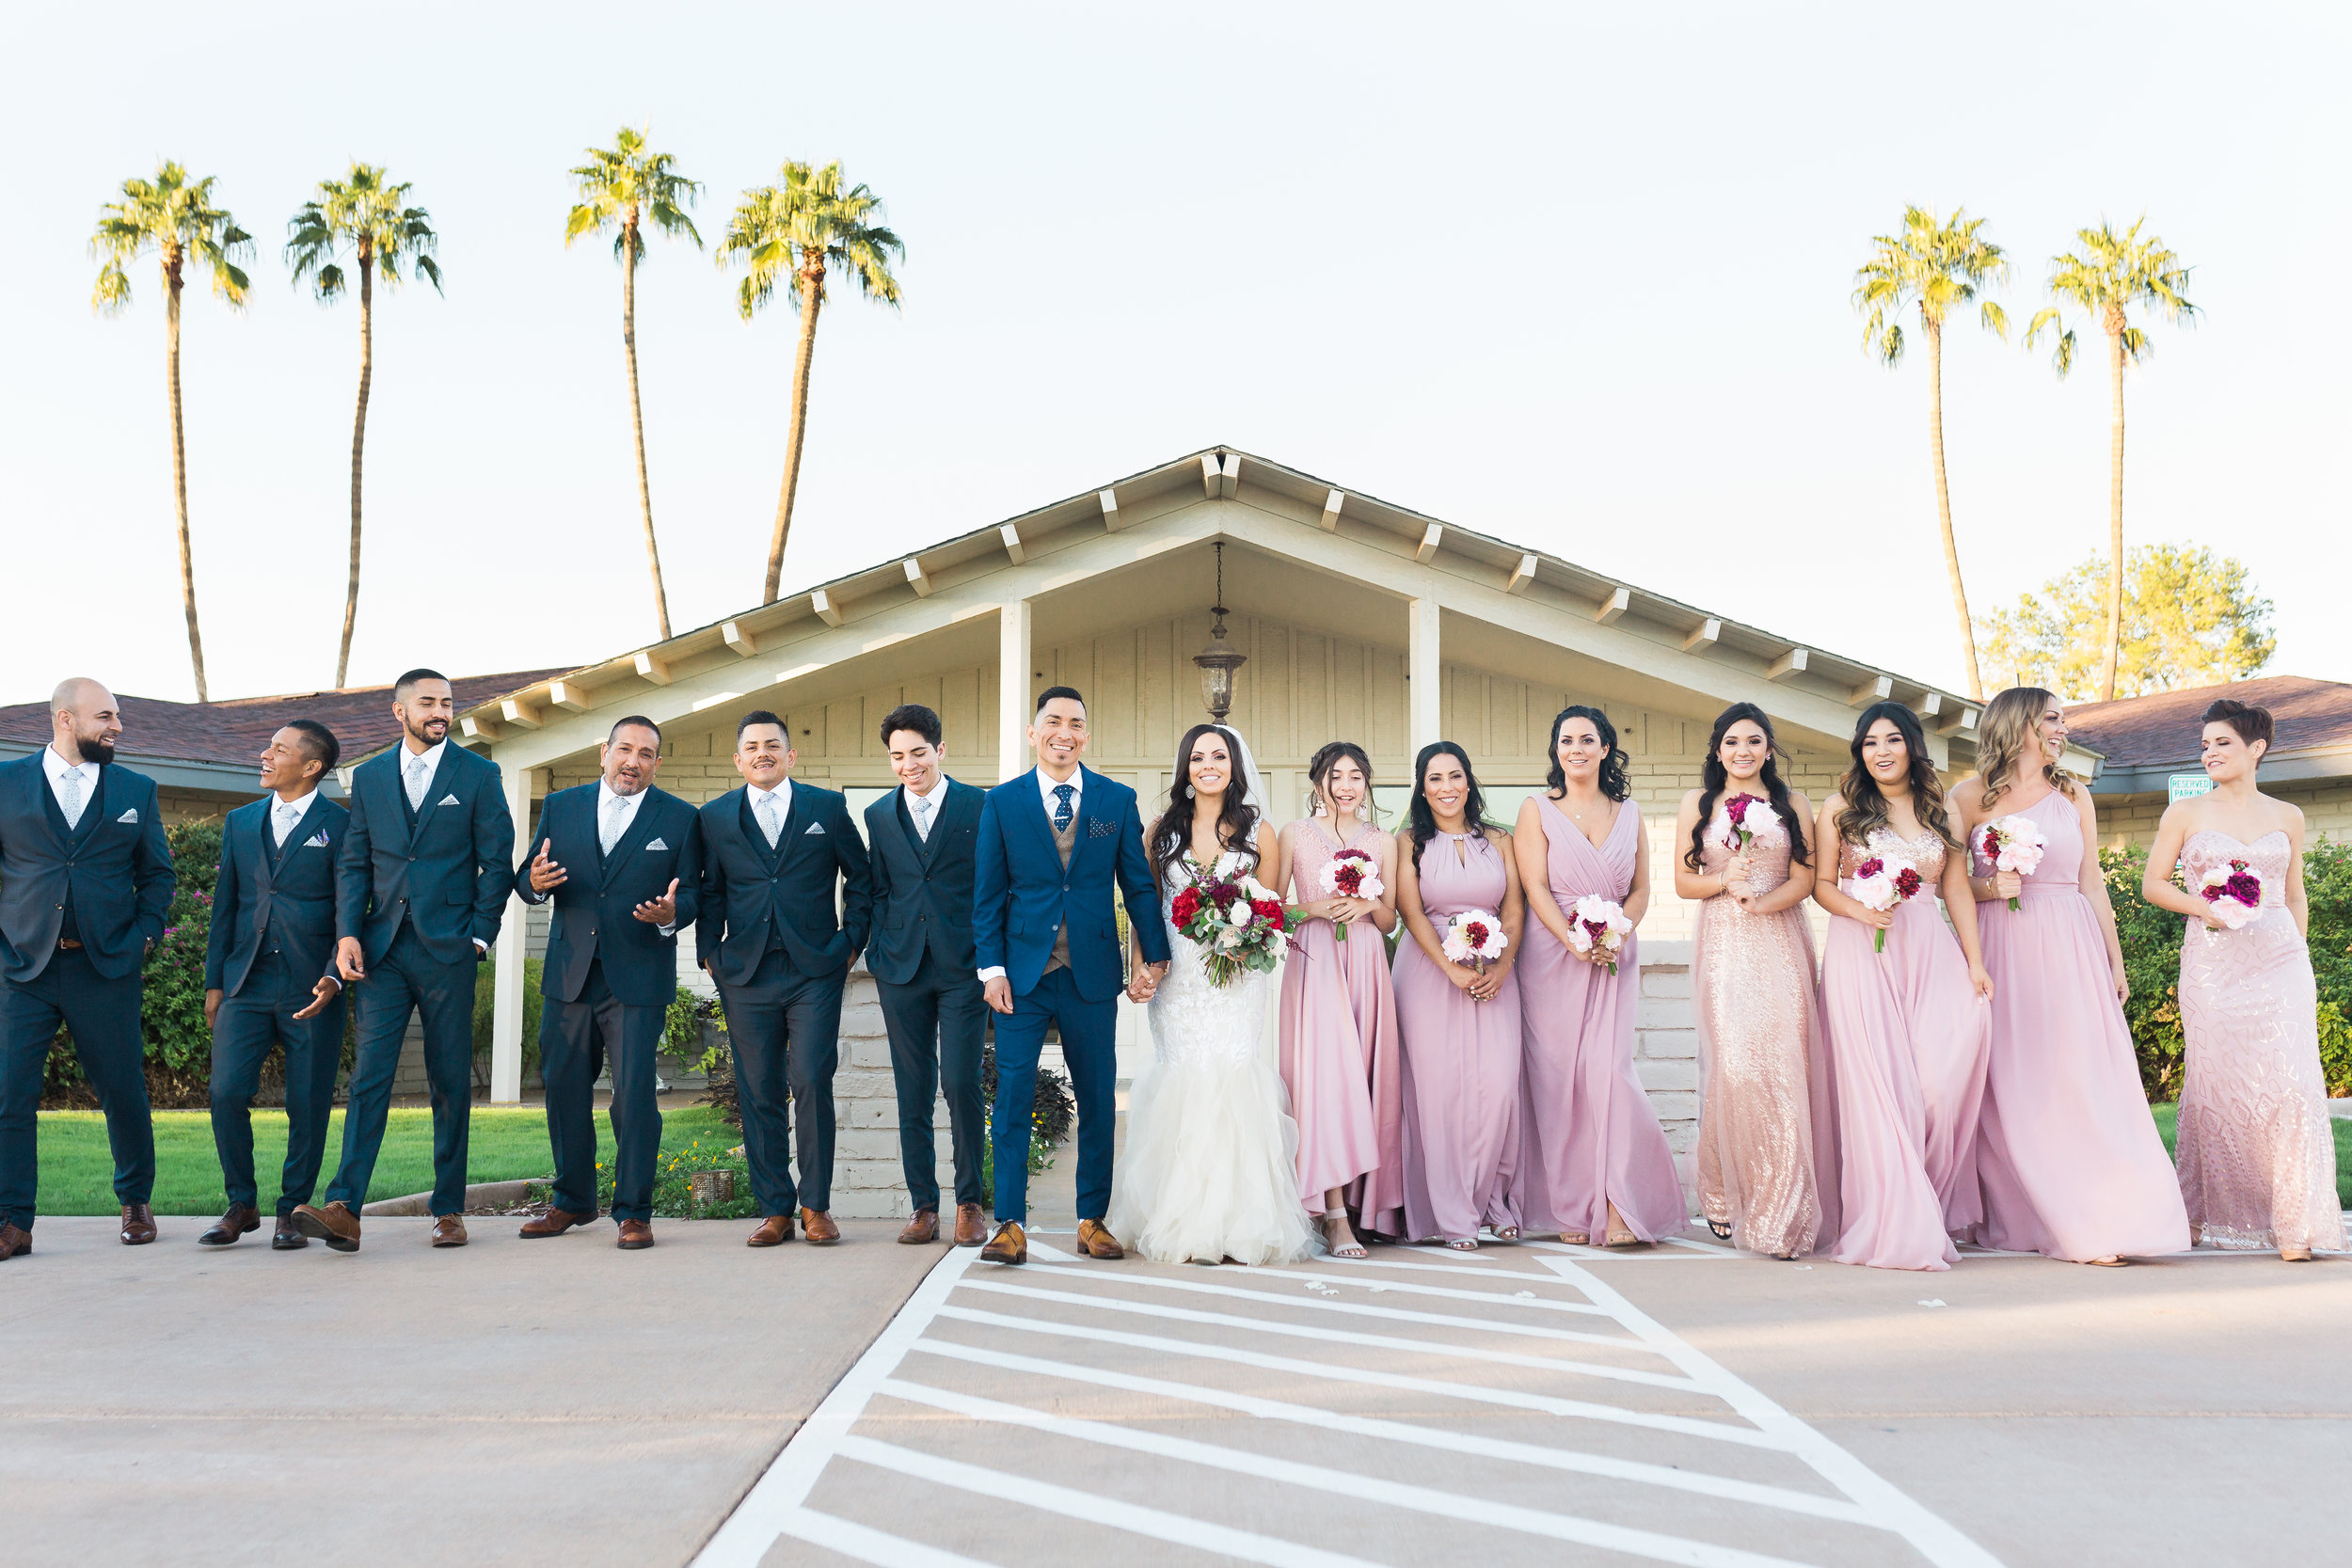 Gather-Estate-Wedding-Mesa-Arizona-Tara-Nichole-Photo-15.jpg